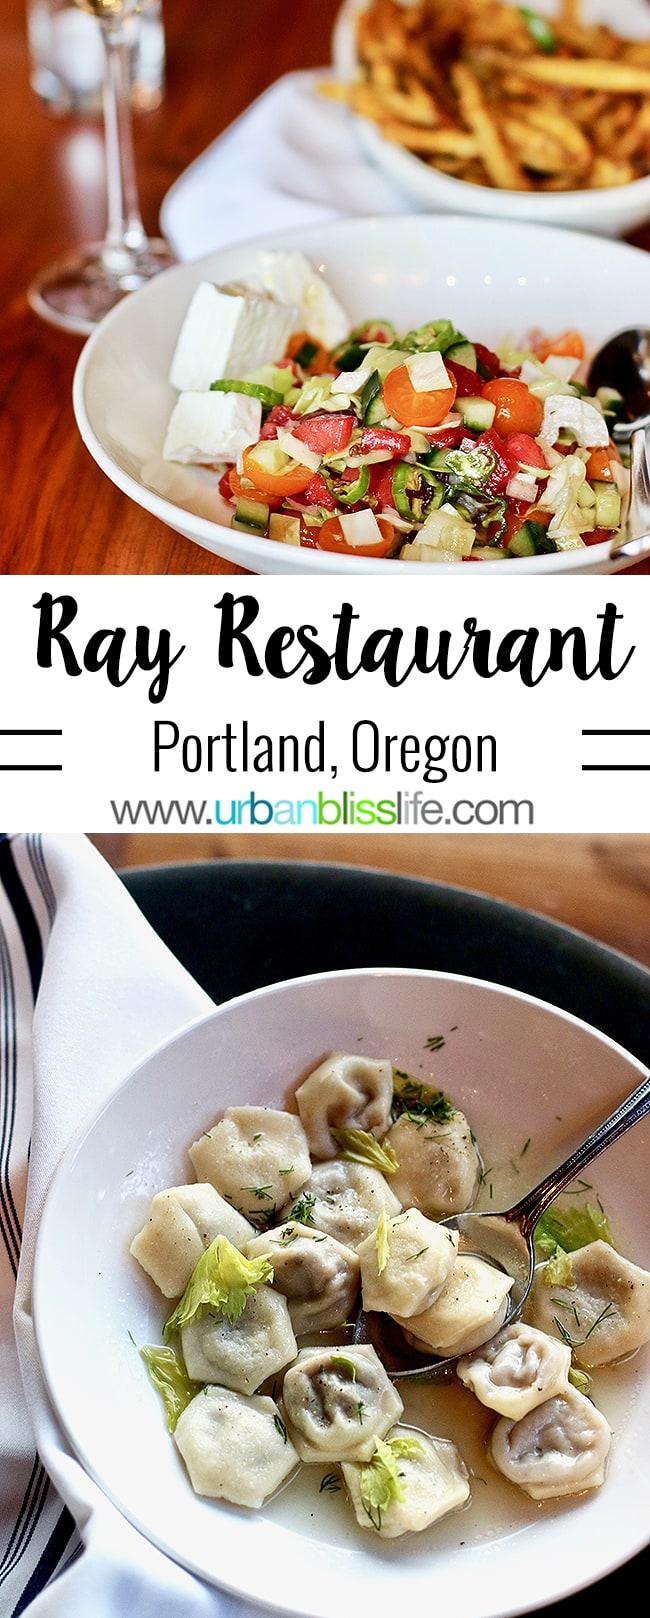 Ray restaurant, Israeli cuisine in Portland, Oregon. Restaurant review on UrbanBlissLife.com